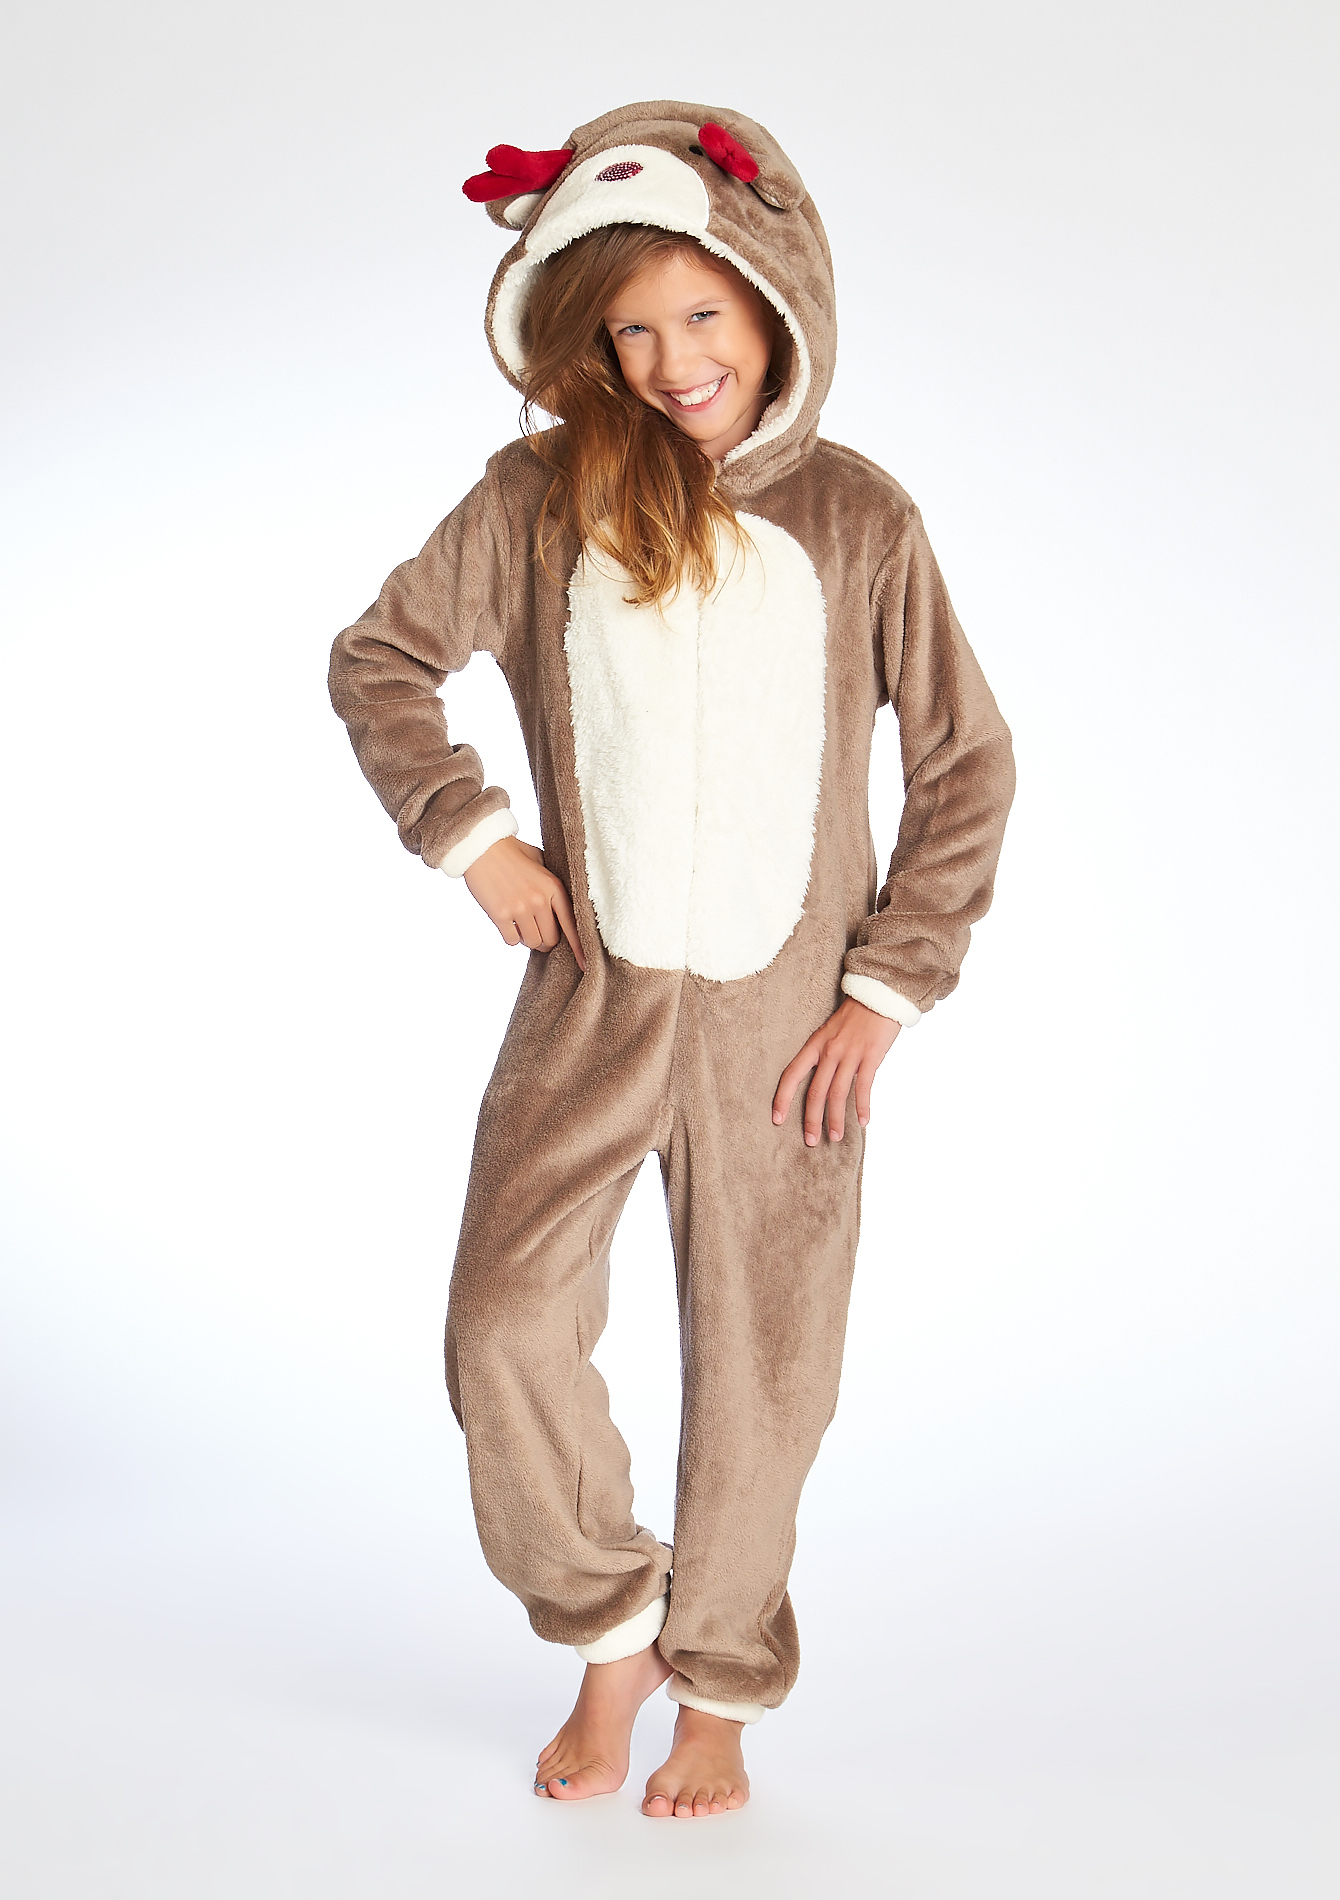 88cbead9553d2 Combinaison pyjama enfant fantaisie - LolaLiza